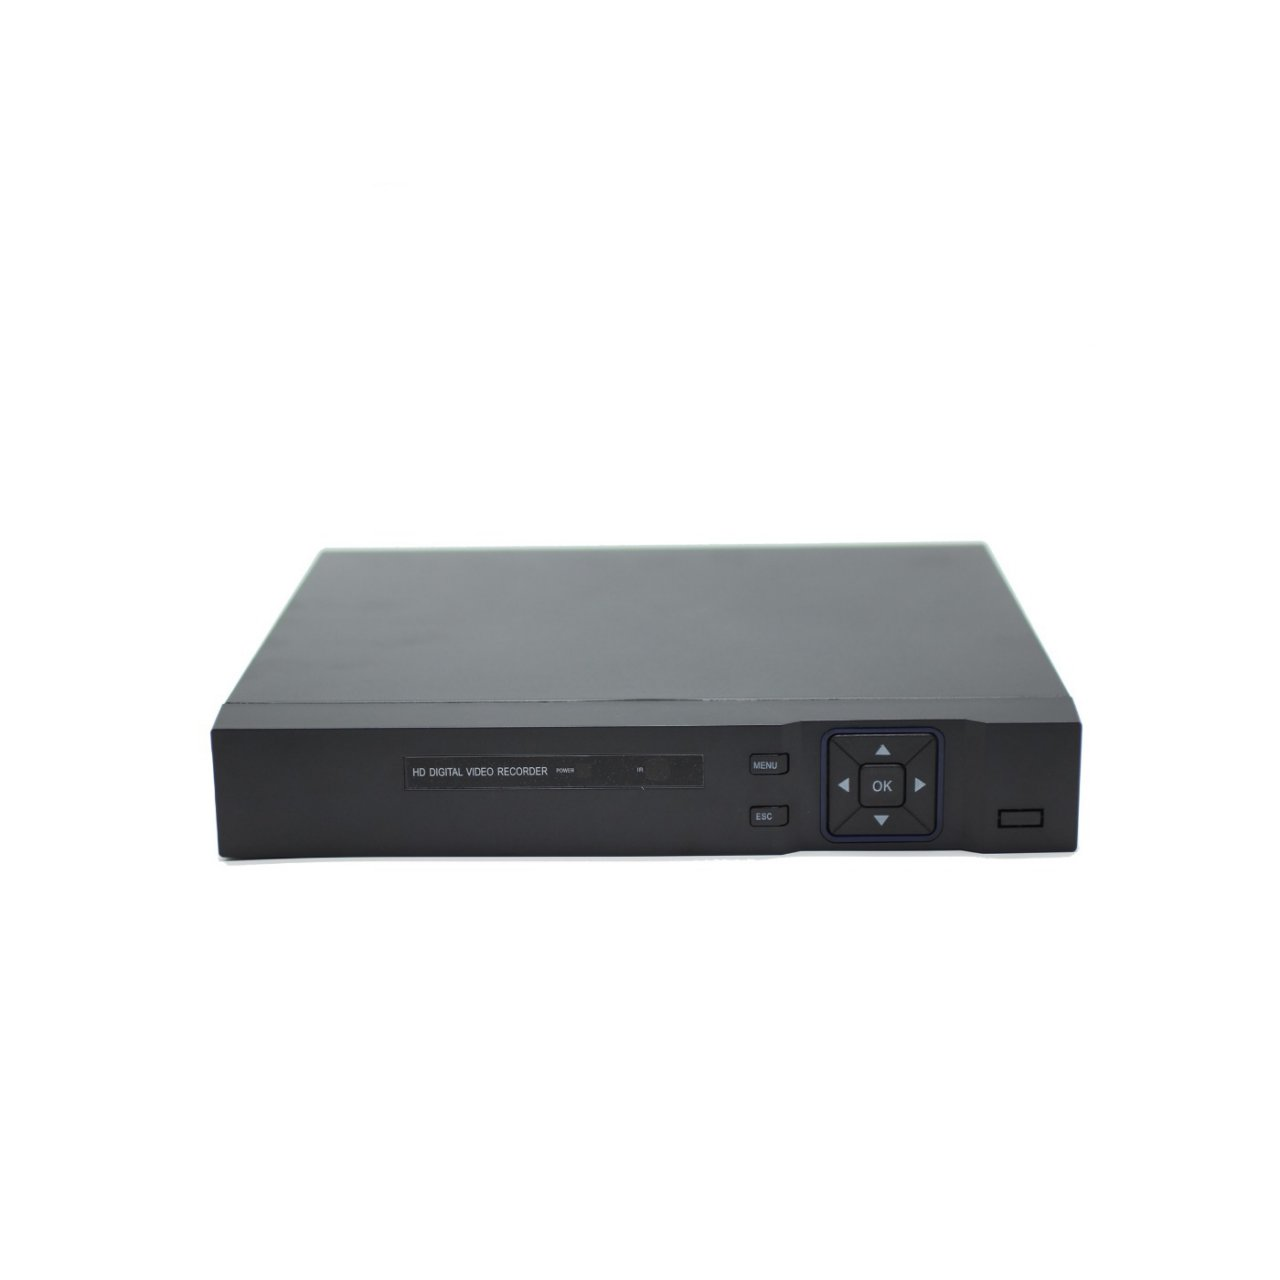 دستگاه DVRچهار کانال 1080N